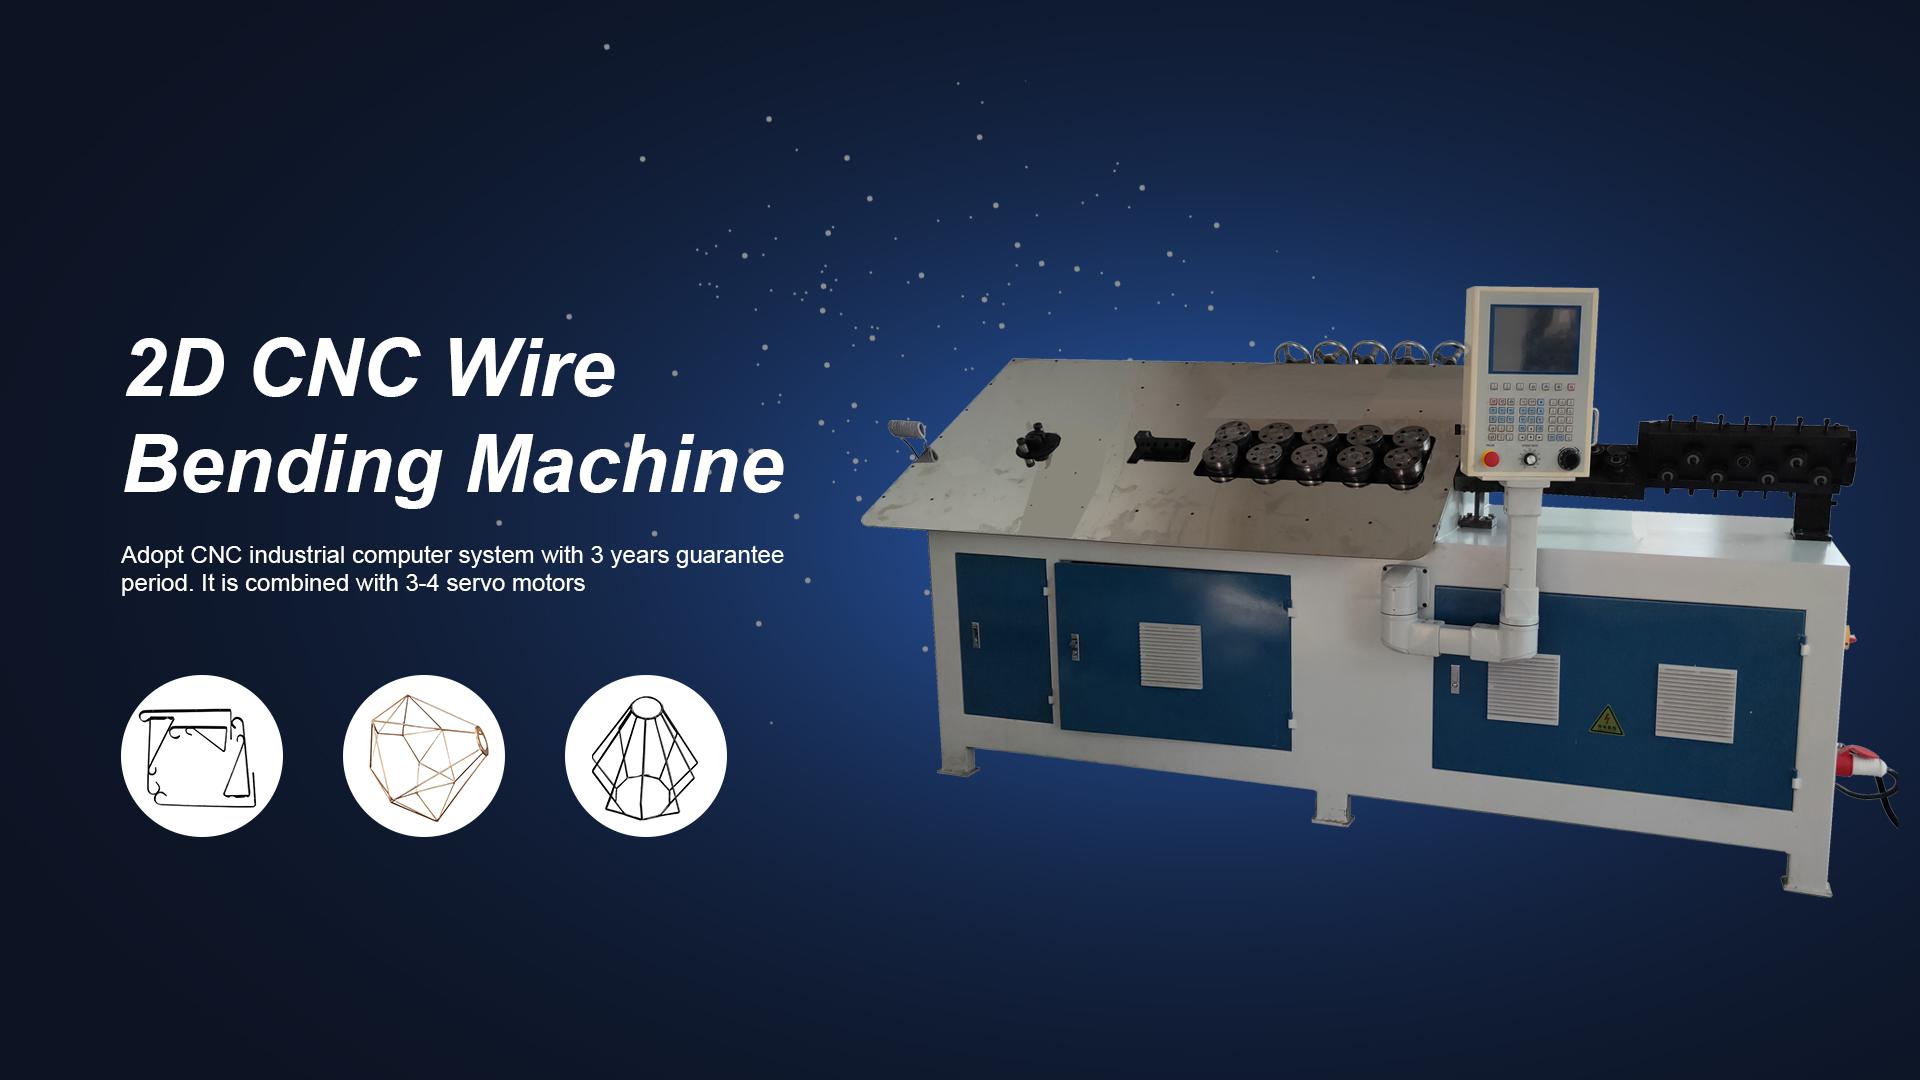 Macchina per piegatura del filo 2D CNC